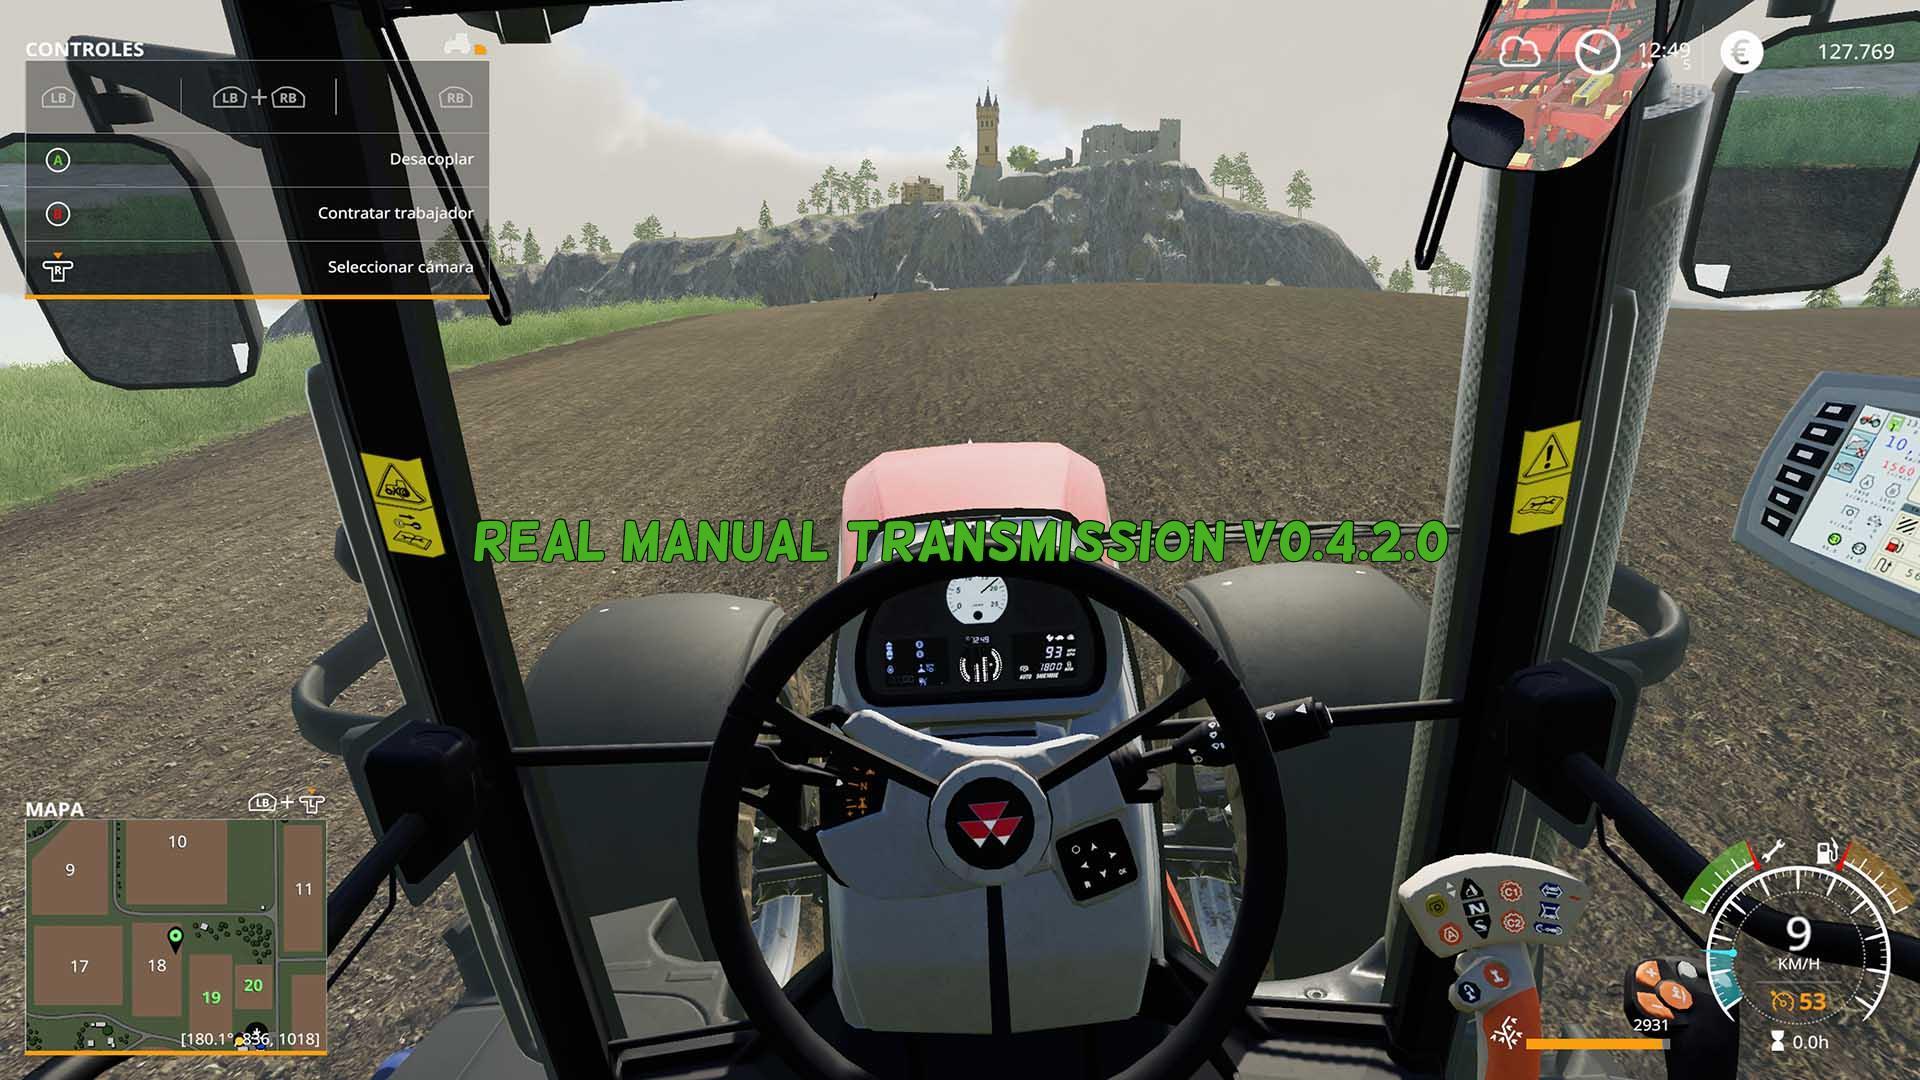 Real Manual Transmission v0 4 2 0 FS19 - Farming Simulator